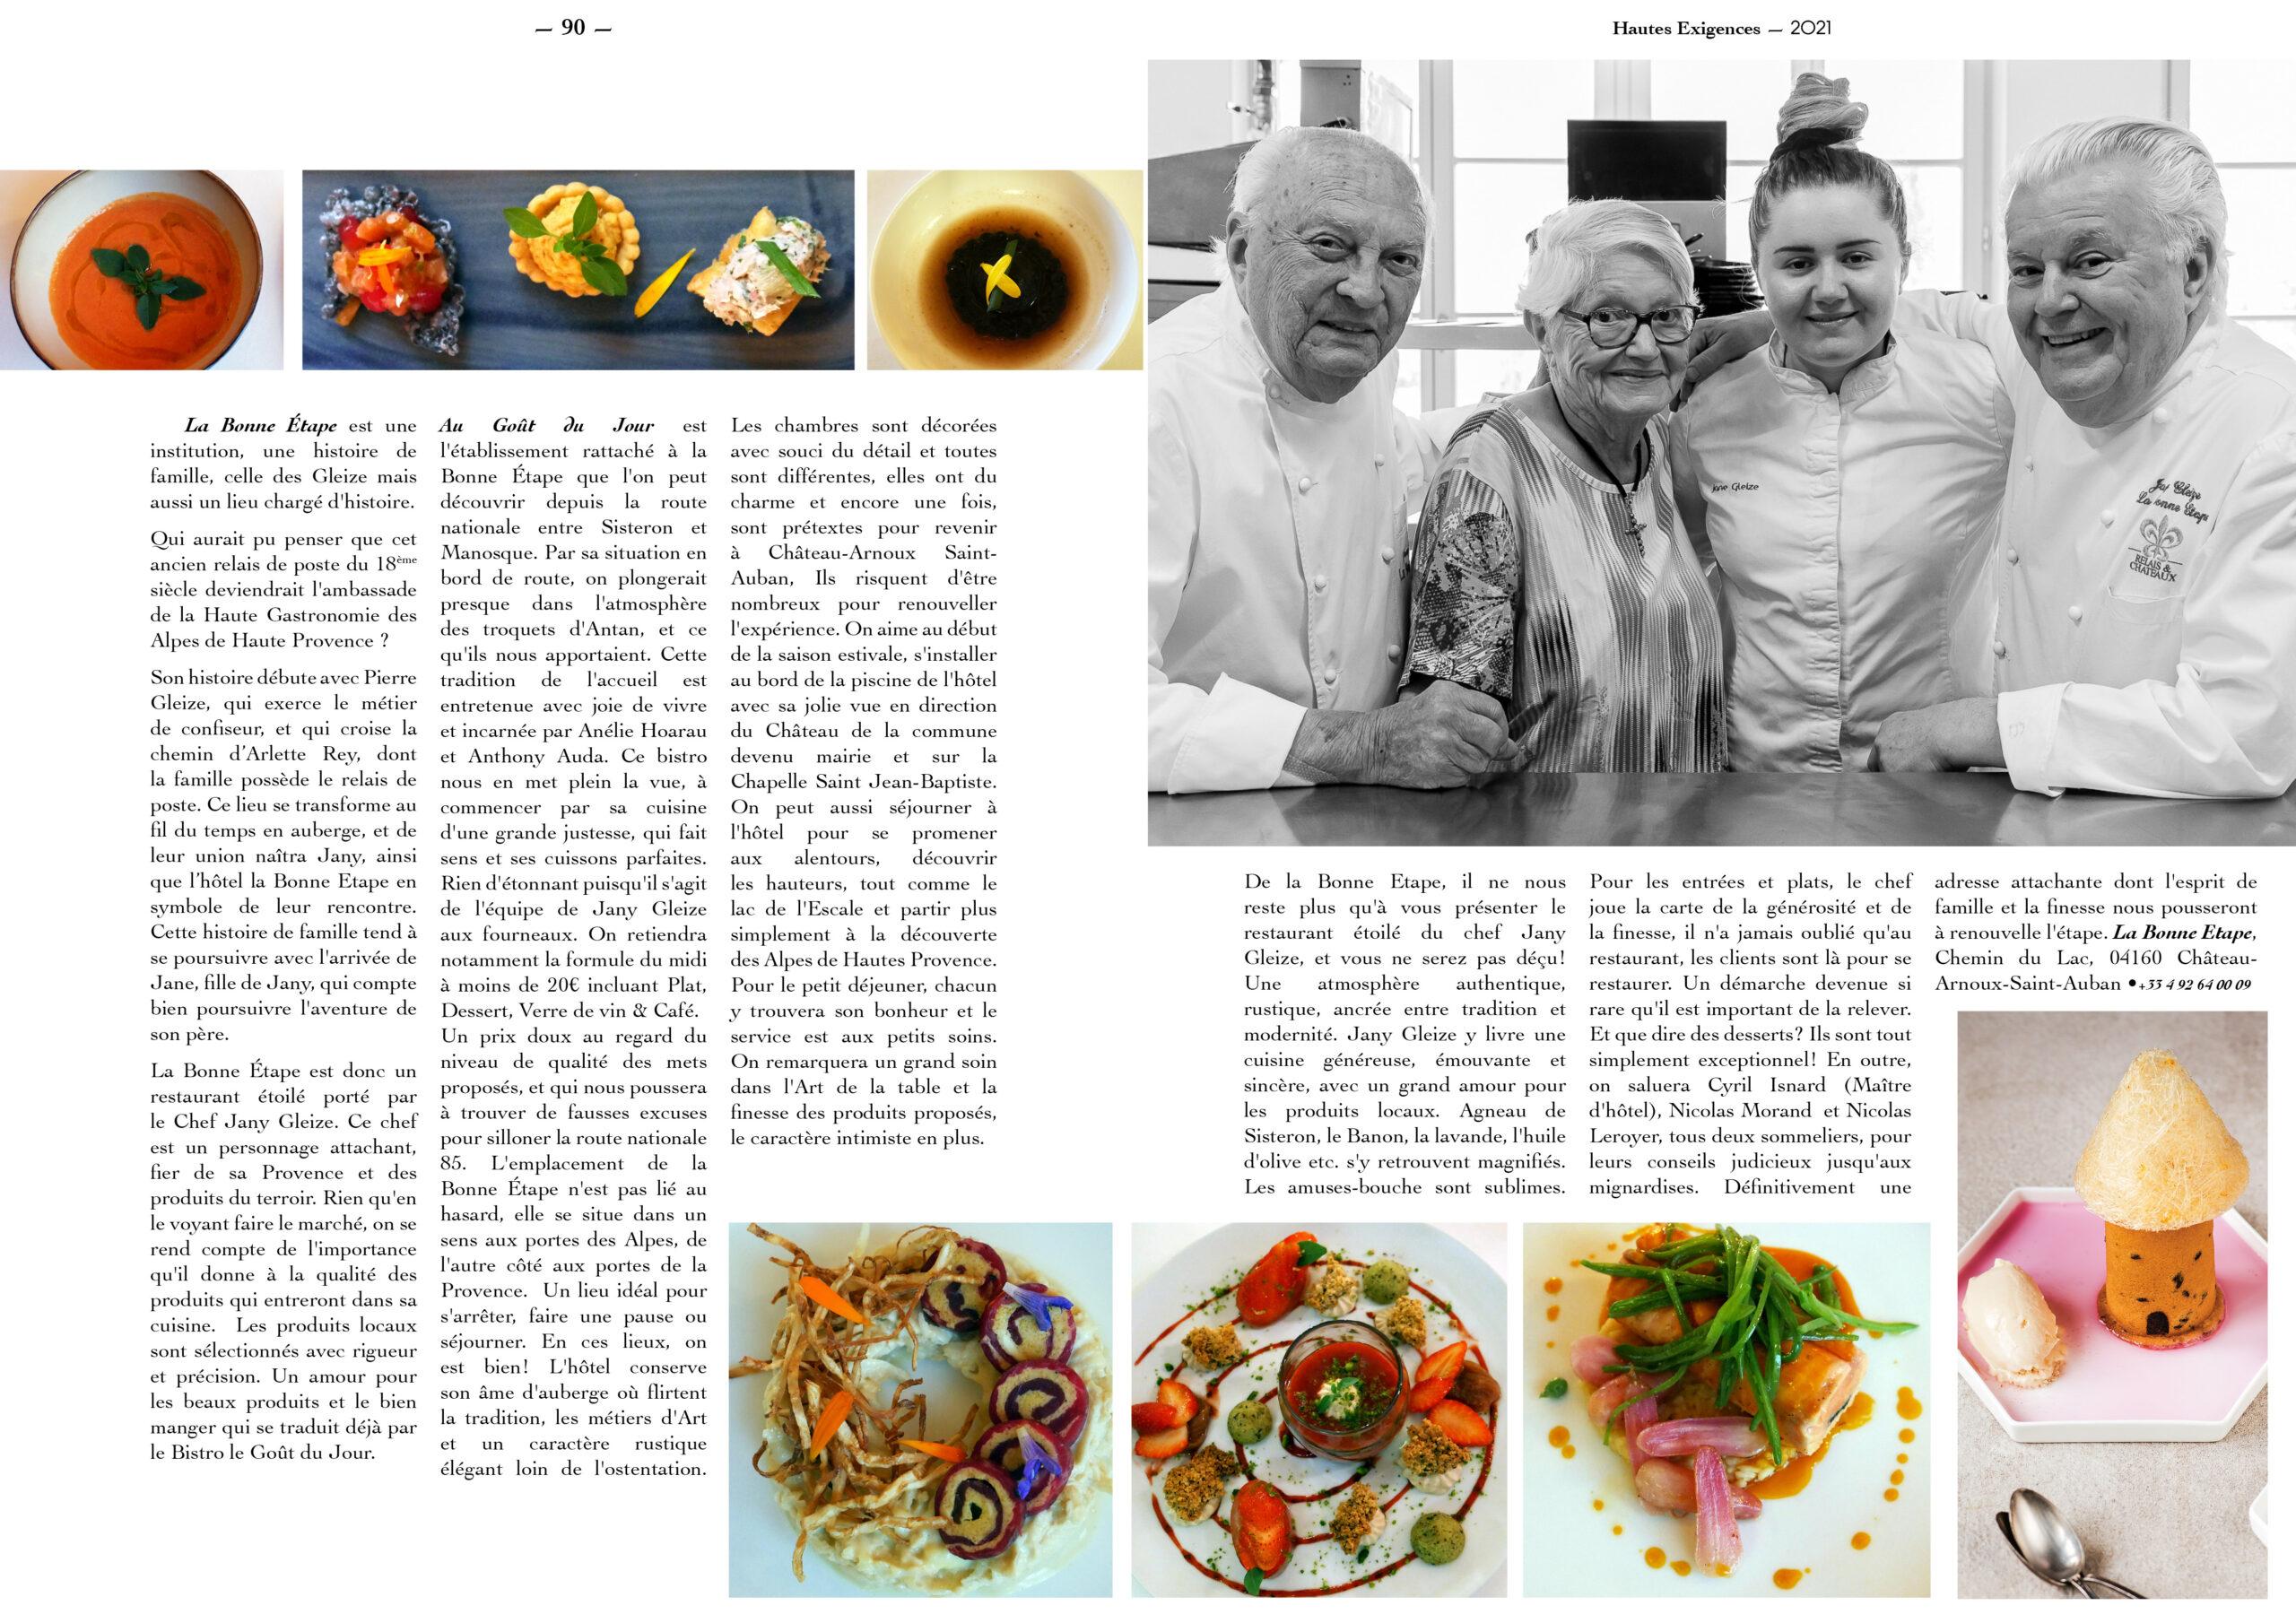 Hautes Exigences Magazine Hors Serie 2021 page 88-89